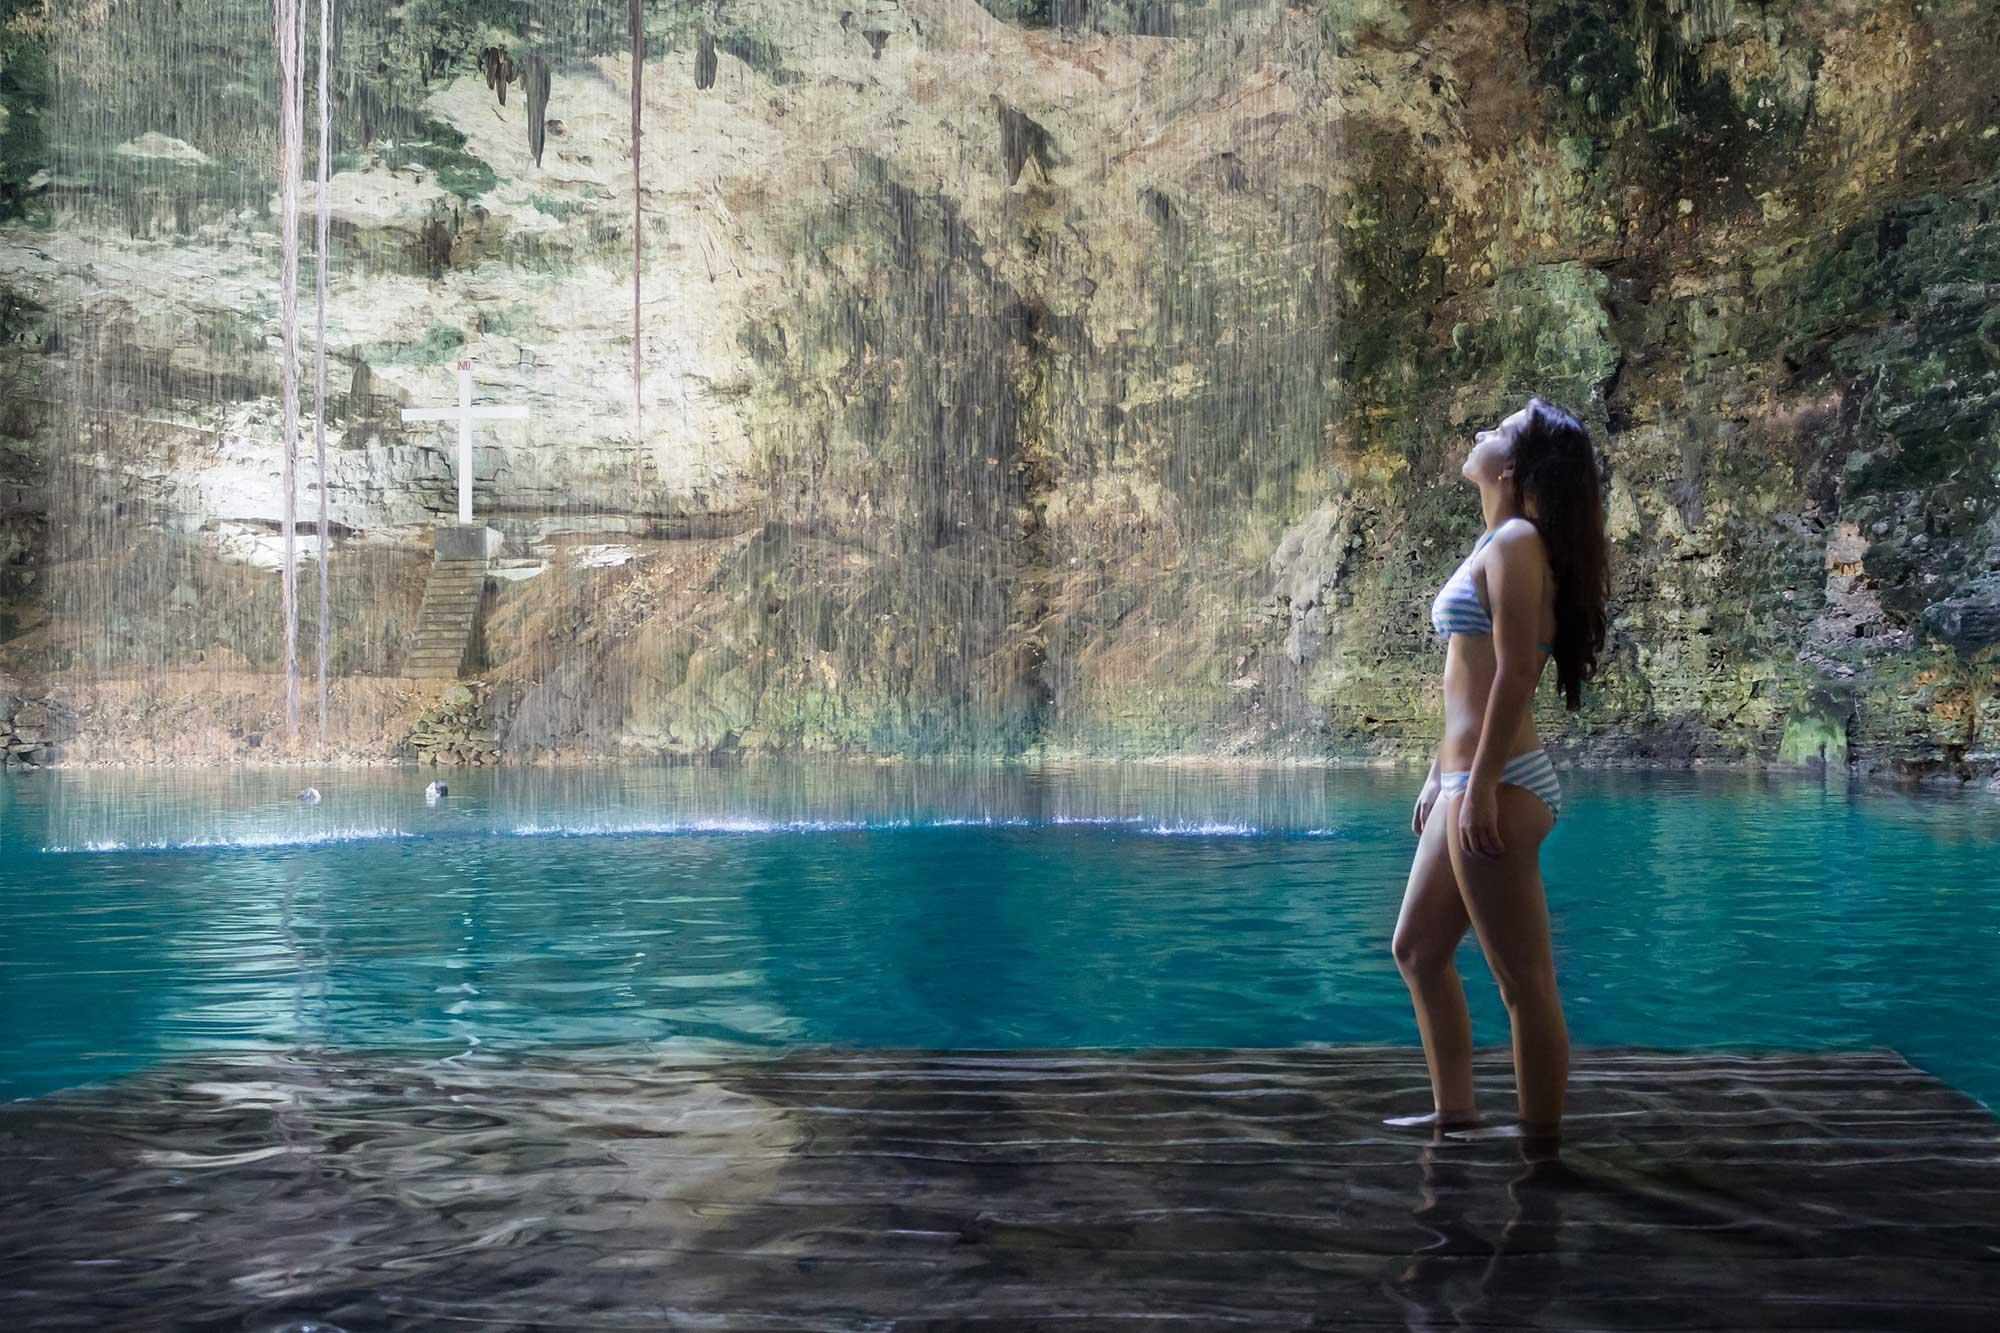 cenote-horizontal-mujer-perfil